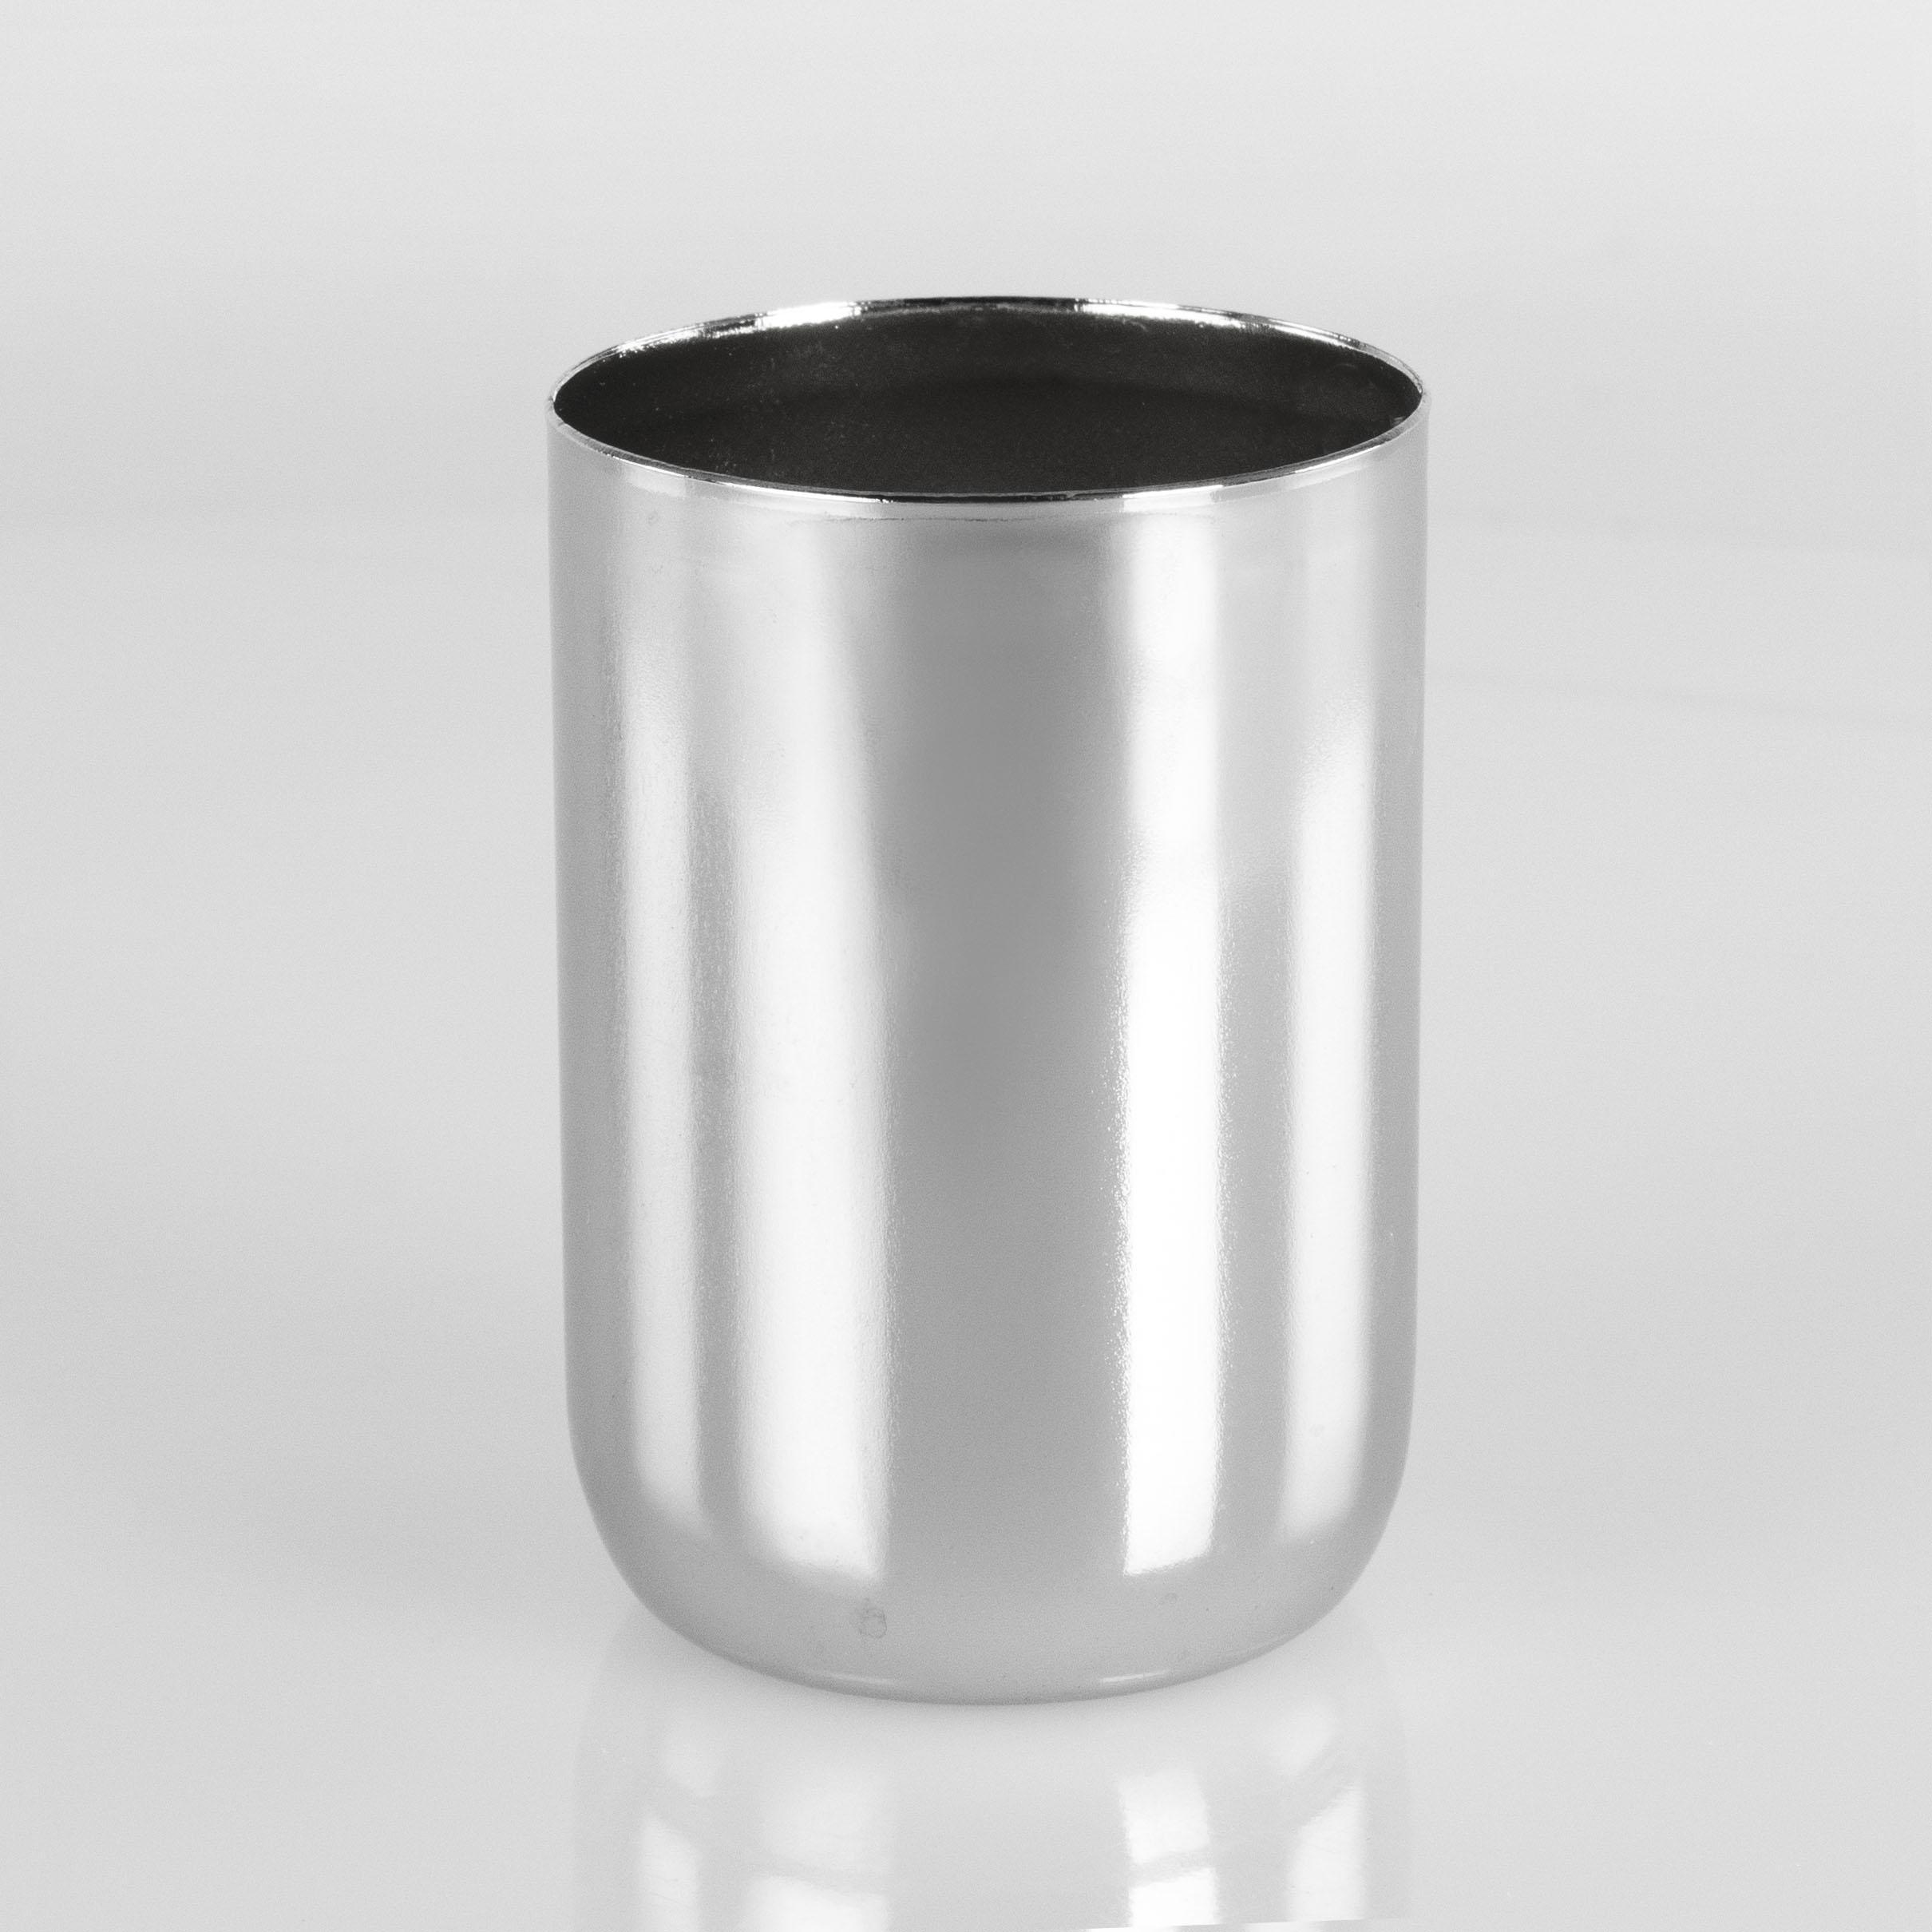 Bicchierino metallico E27 Ø4 x h6 cm  finitura galvanica cromo lucido.